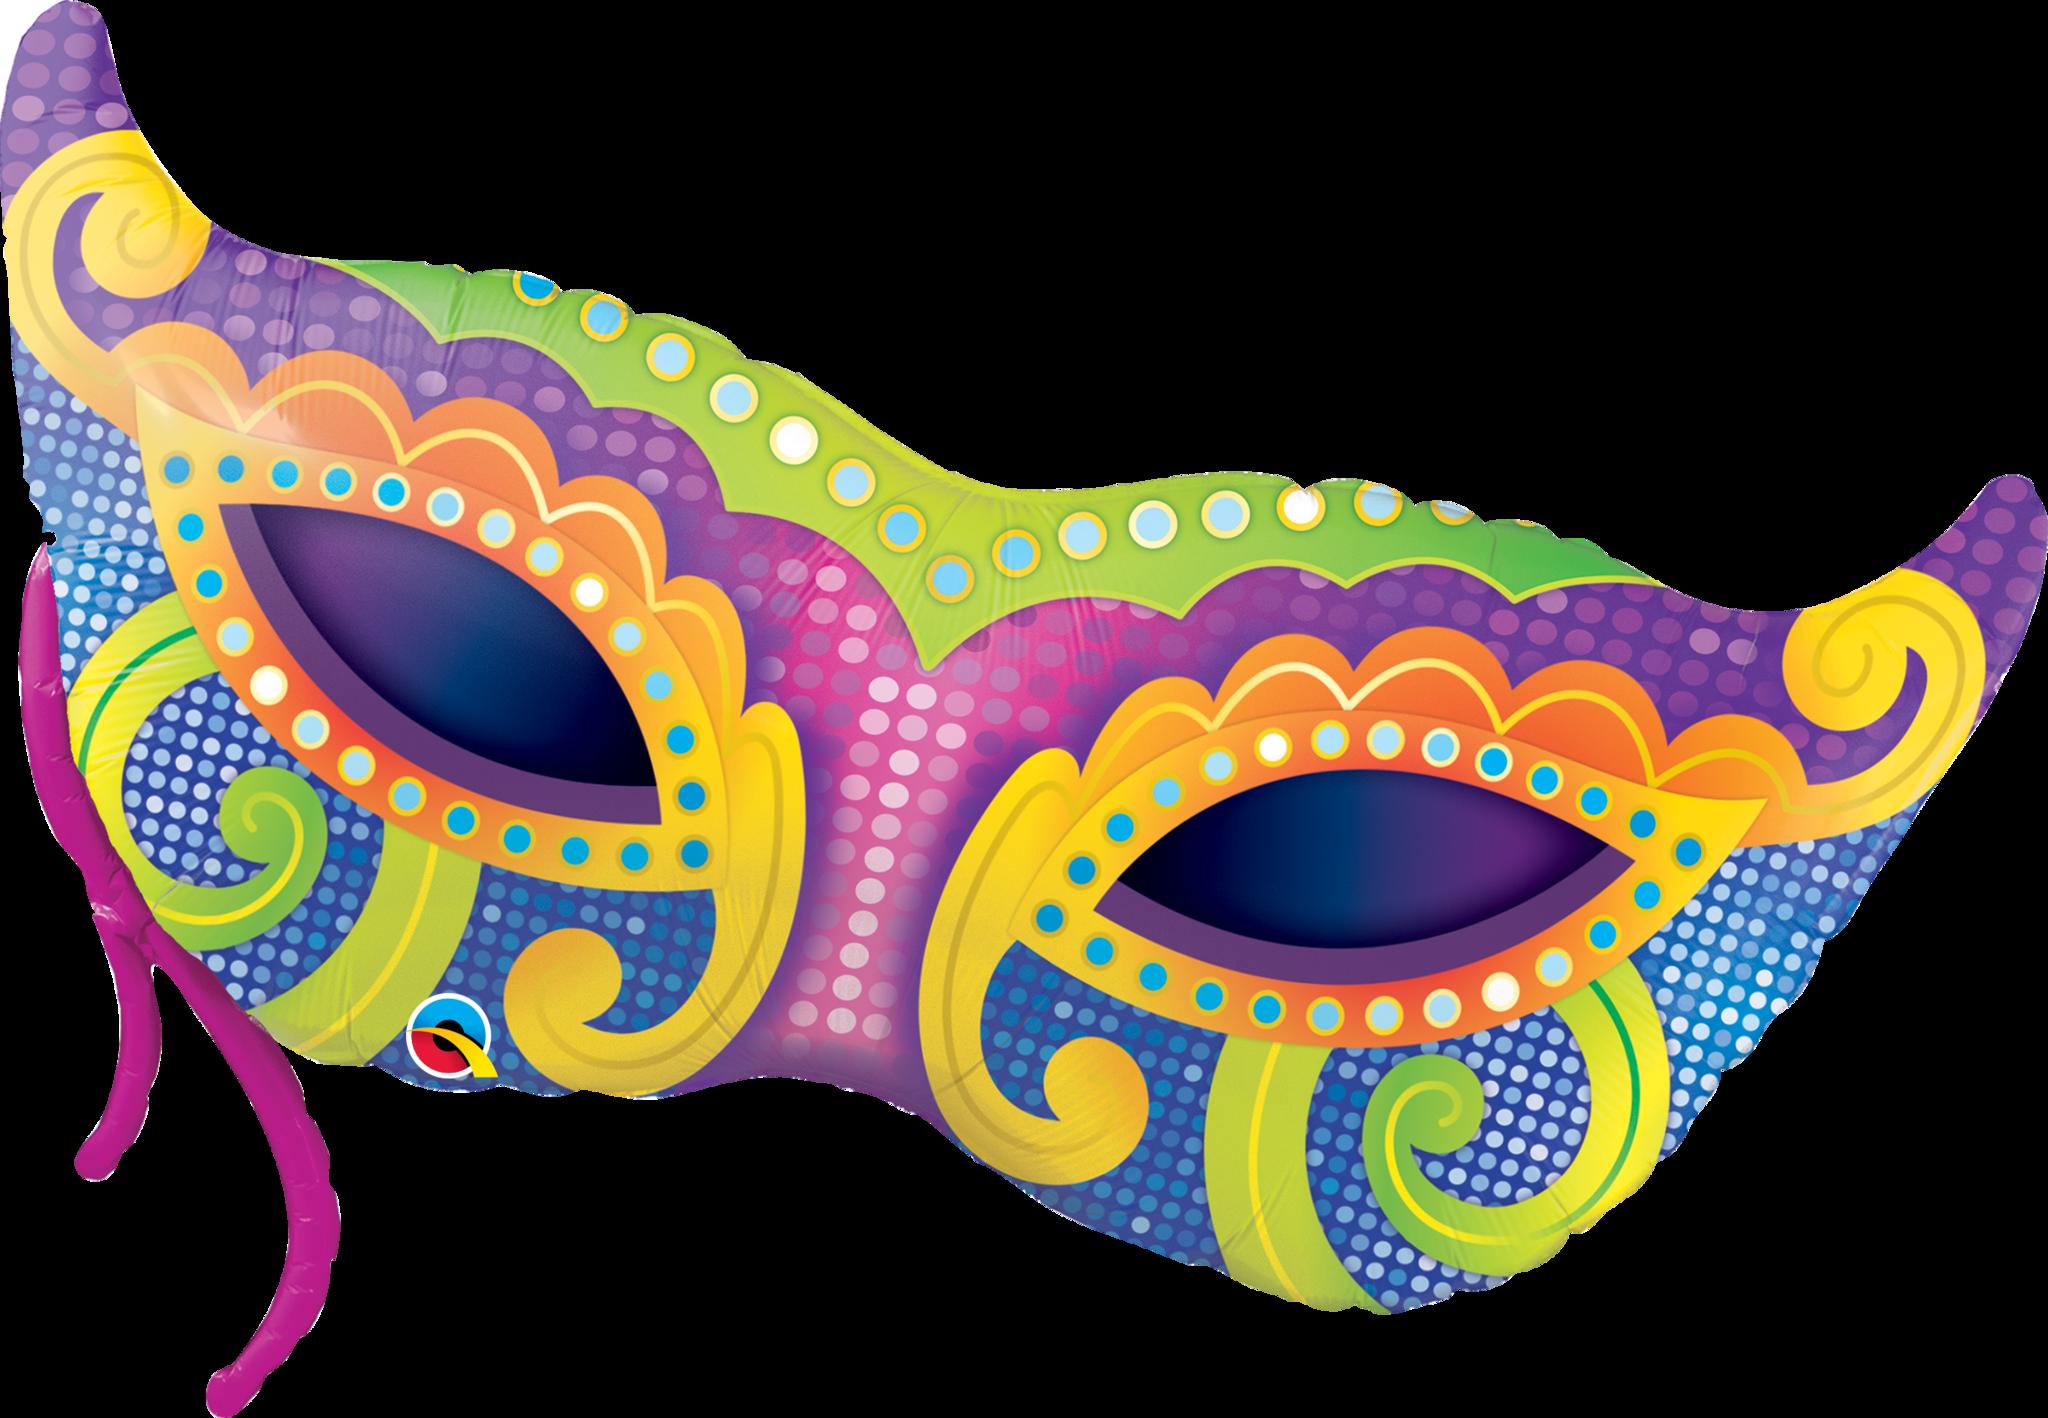 Mardis gras crown clipart picture freeuse download Mardi Gras Mask (49+) picture freeuse download